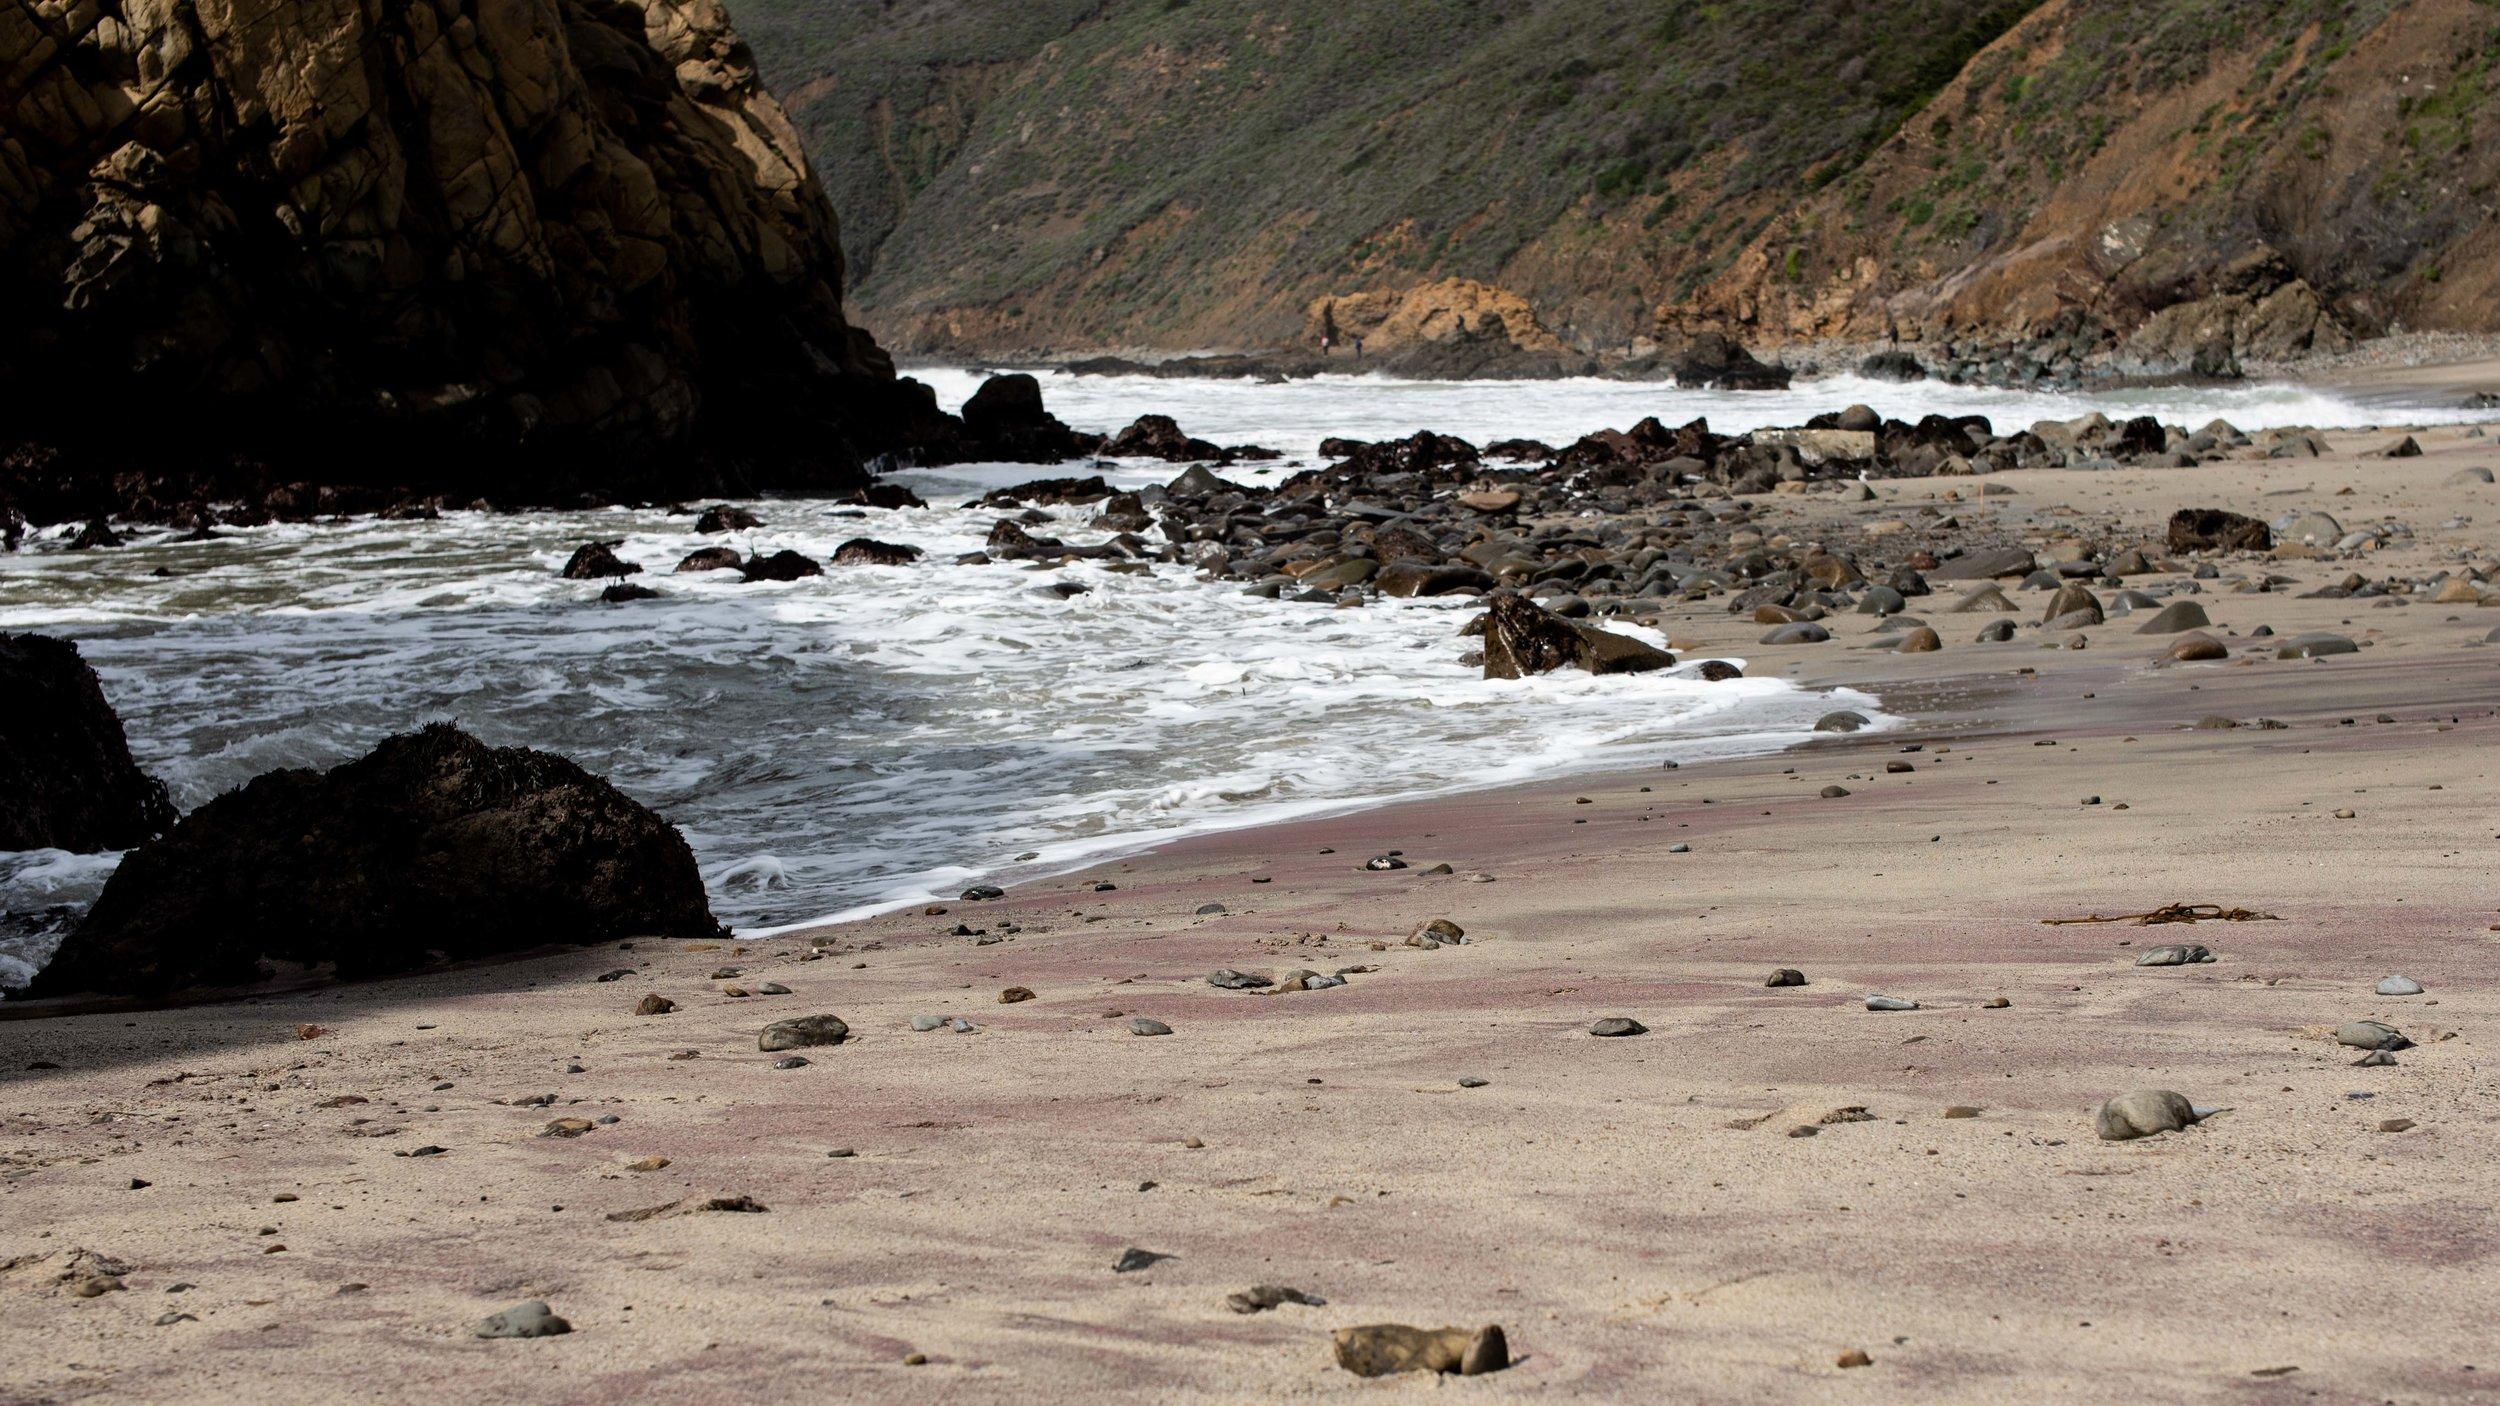 Pfeiffer purple sand beach